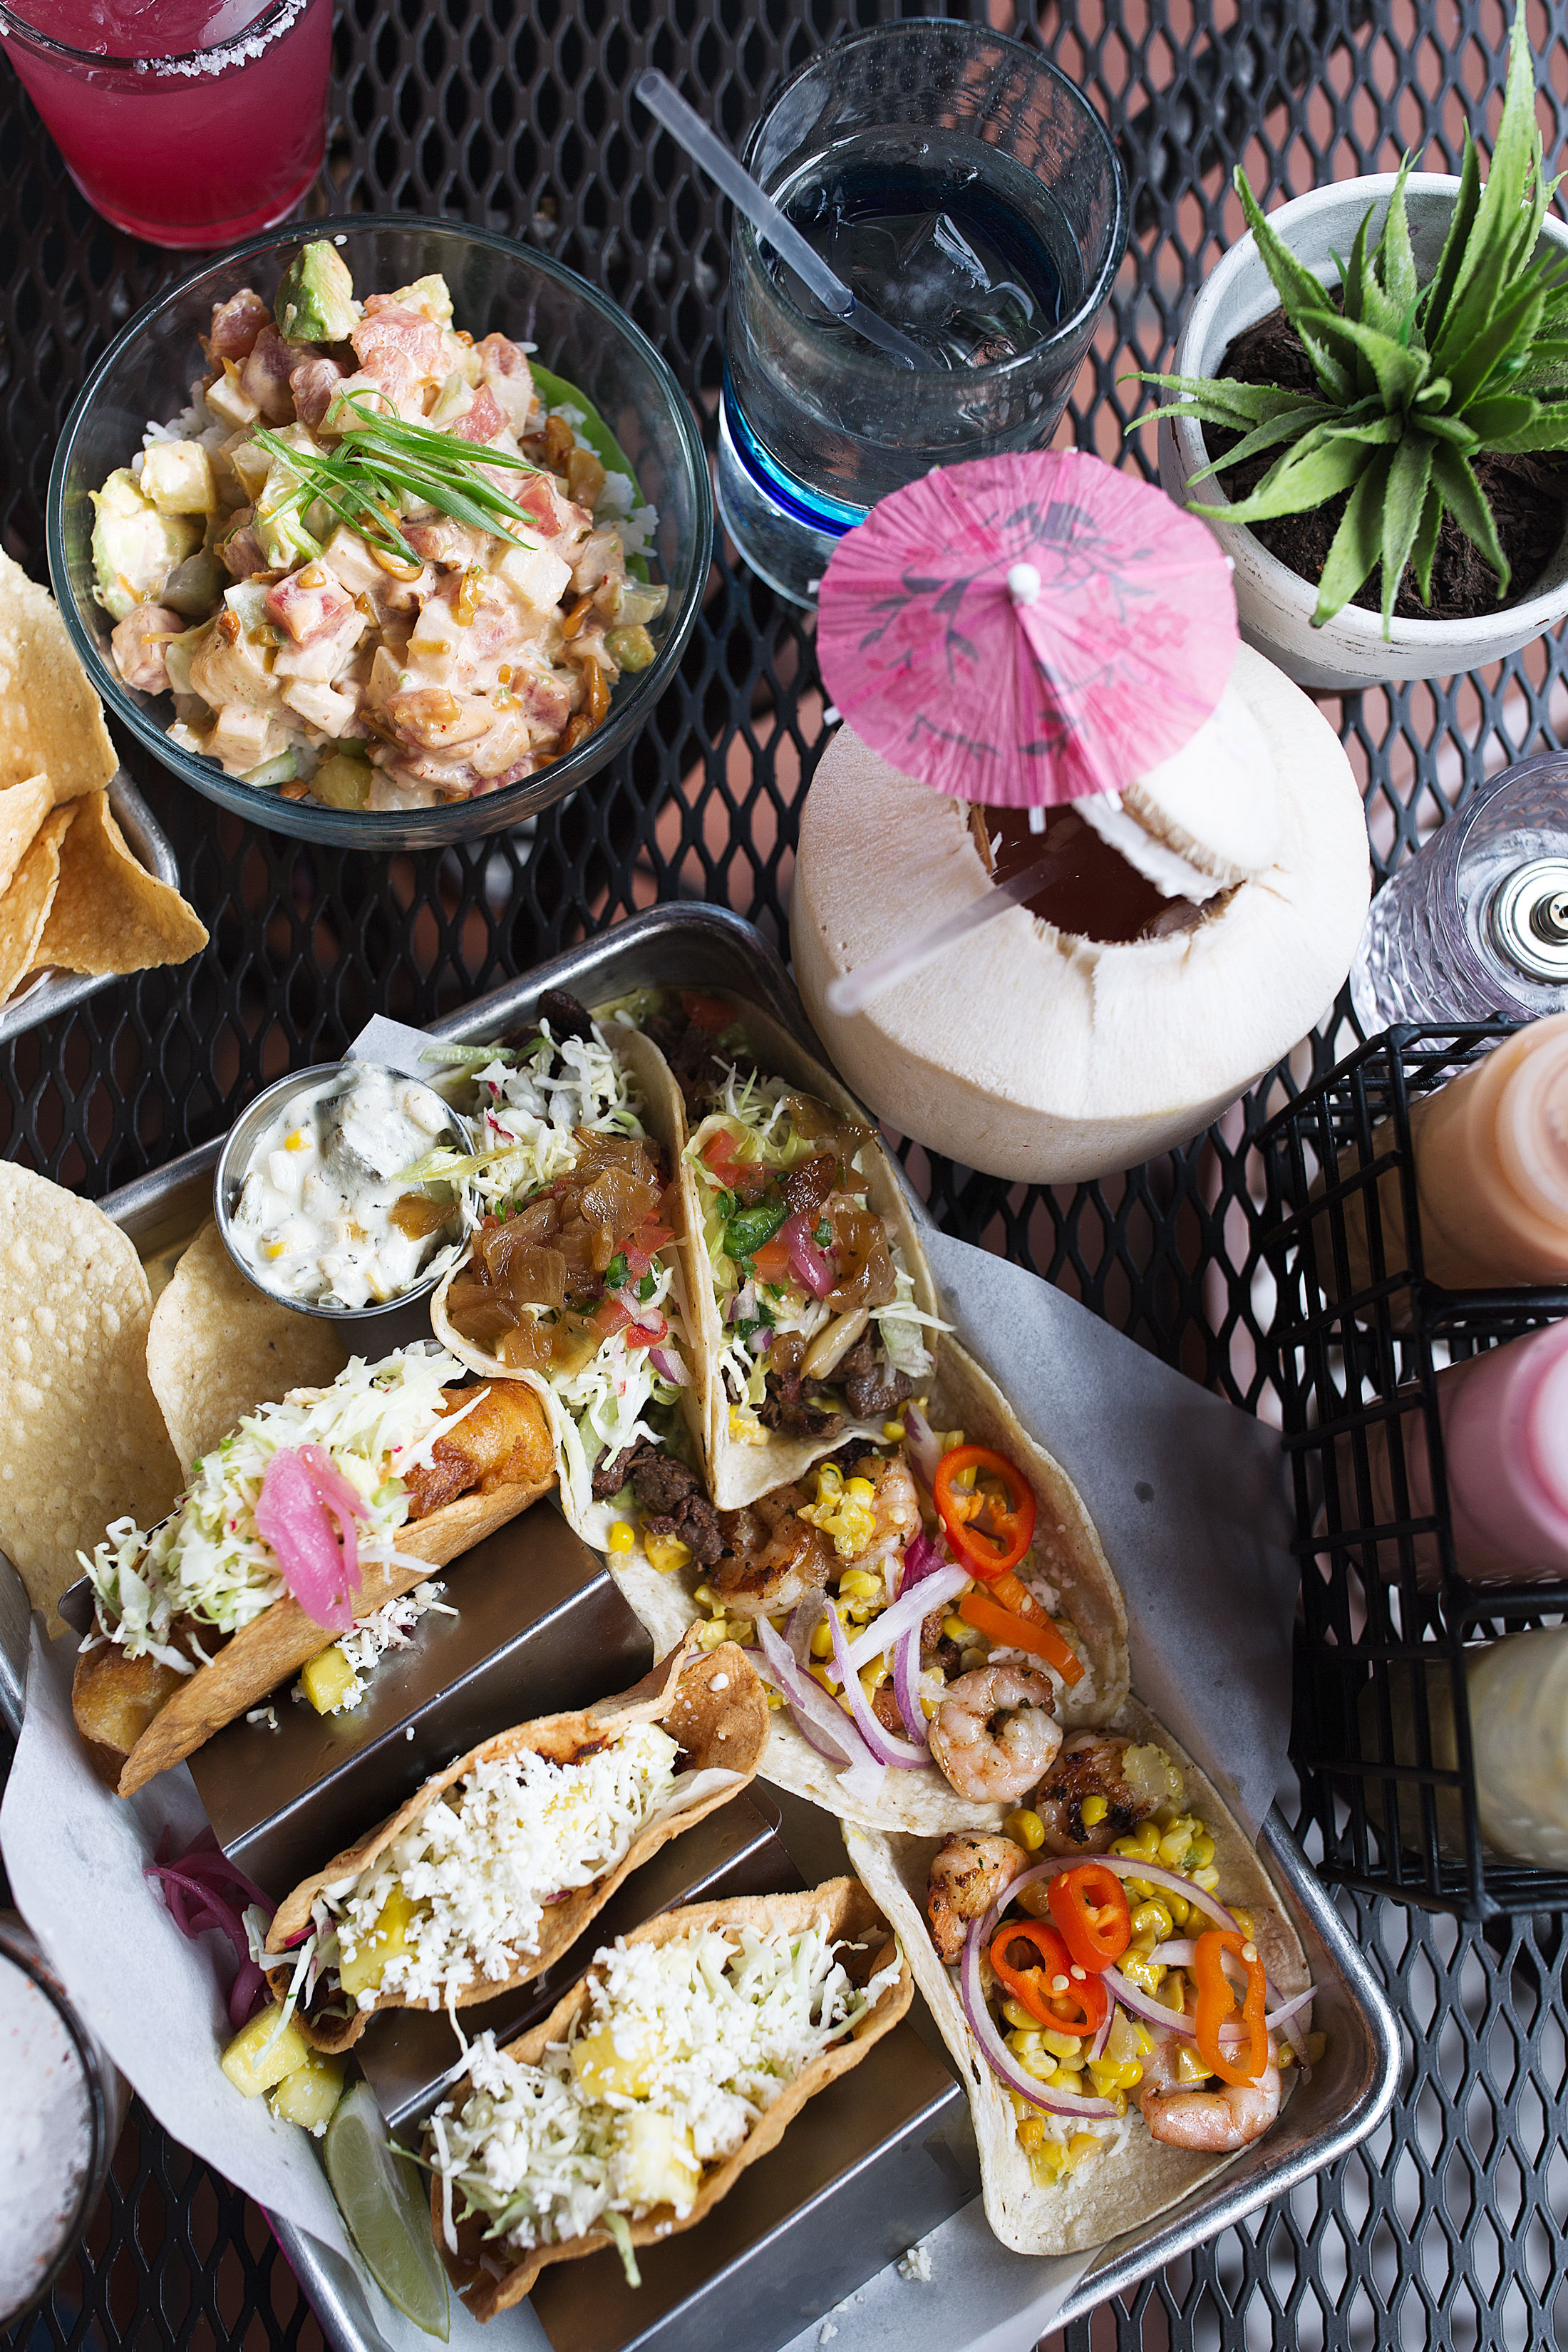 Diego-Pops-Tacos-Scottsdale-AZ.jpg